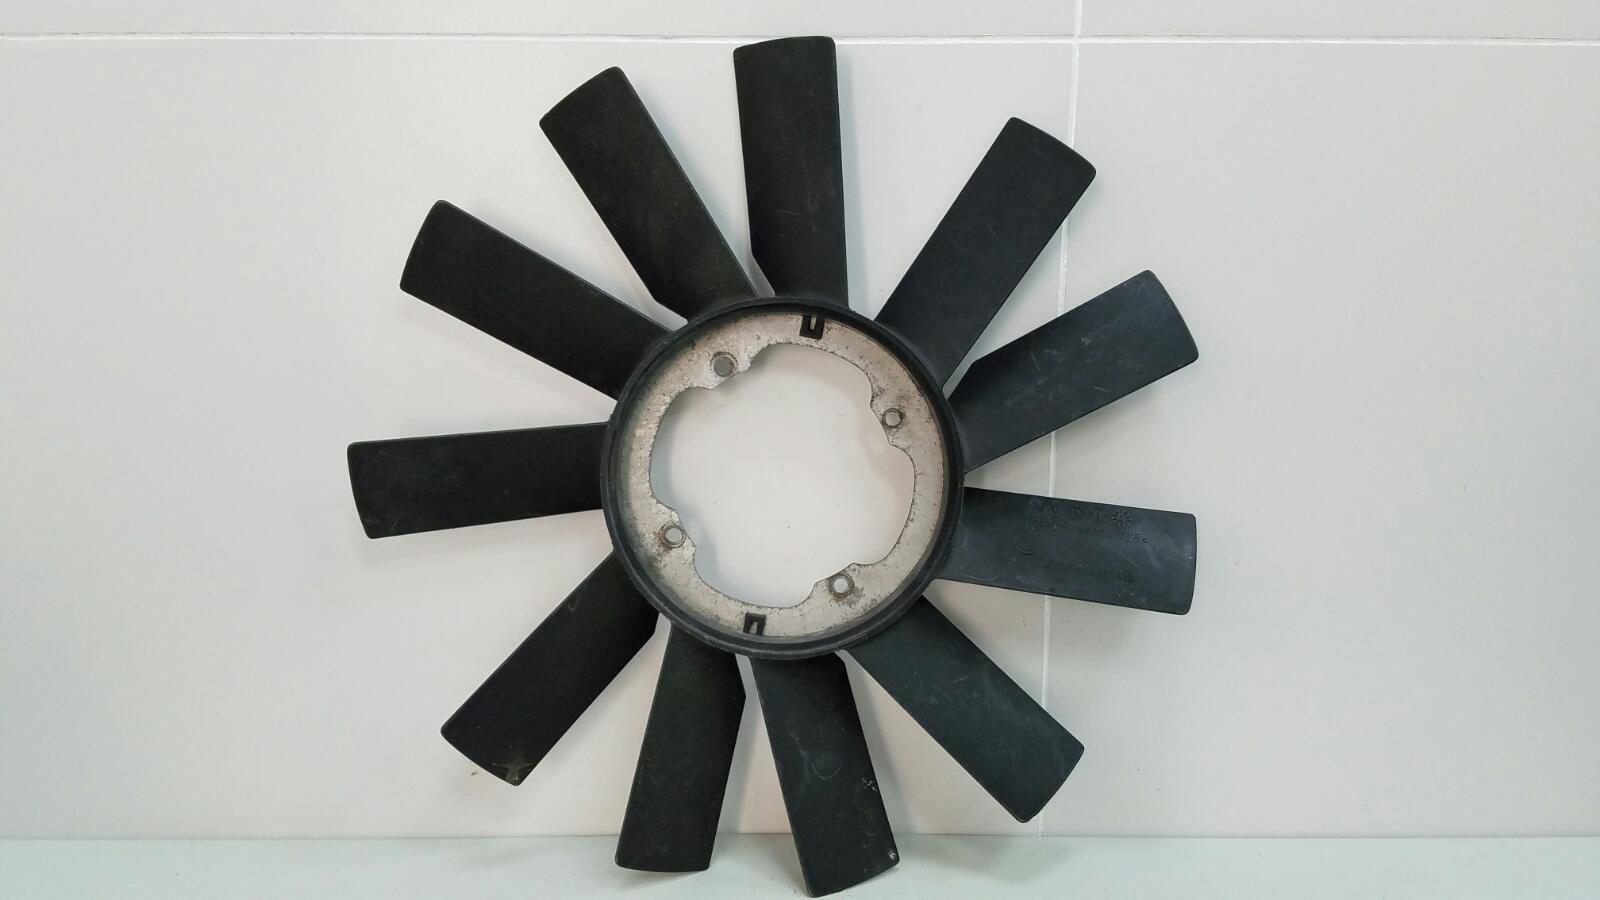 Вентилятор охлаждения радиатора Bmw 316I E36 M43 B16 1.6Л 1998